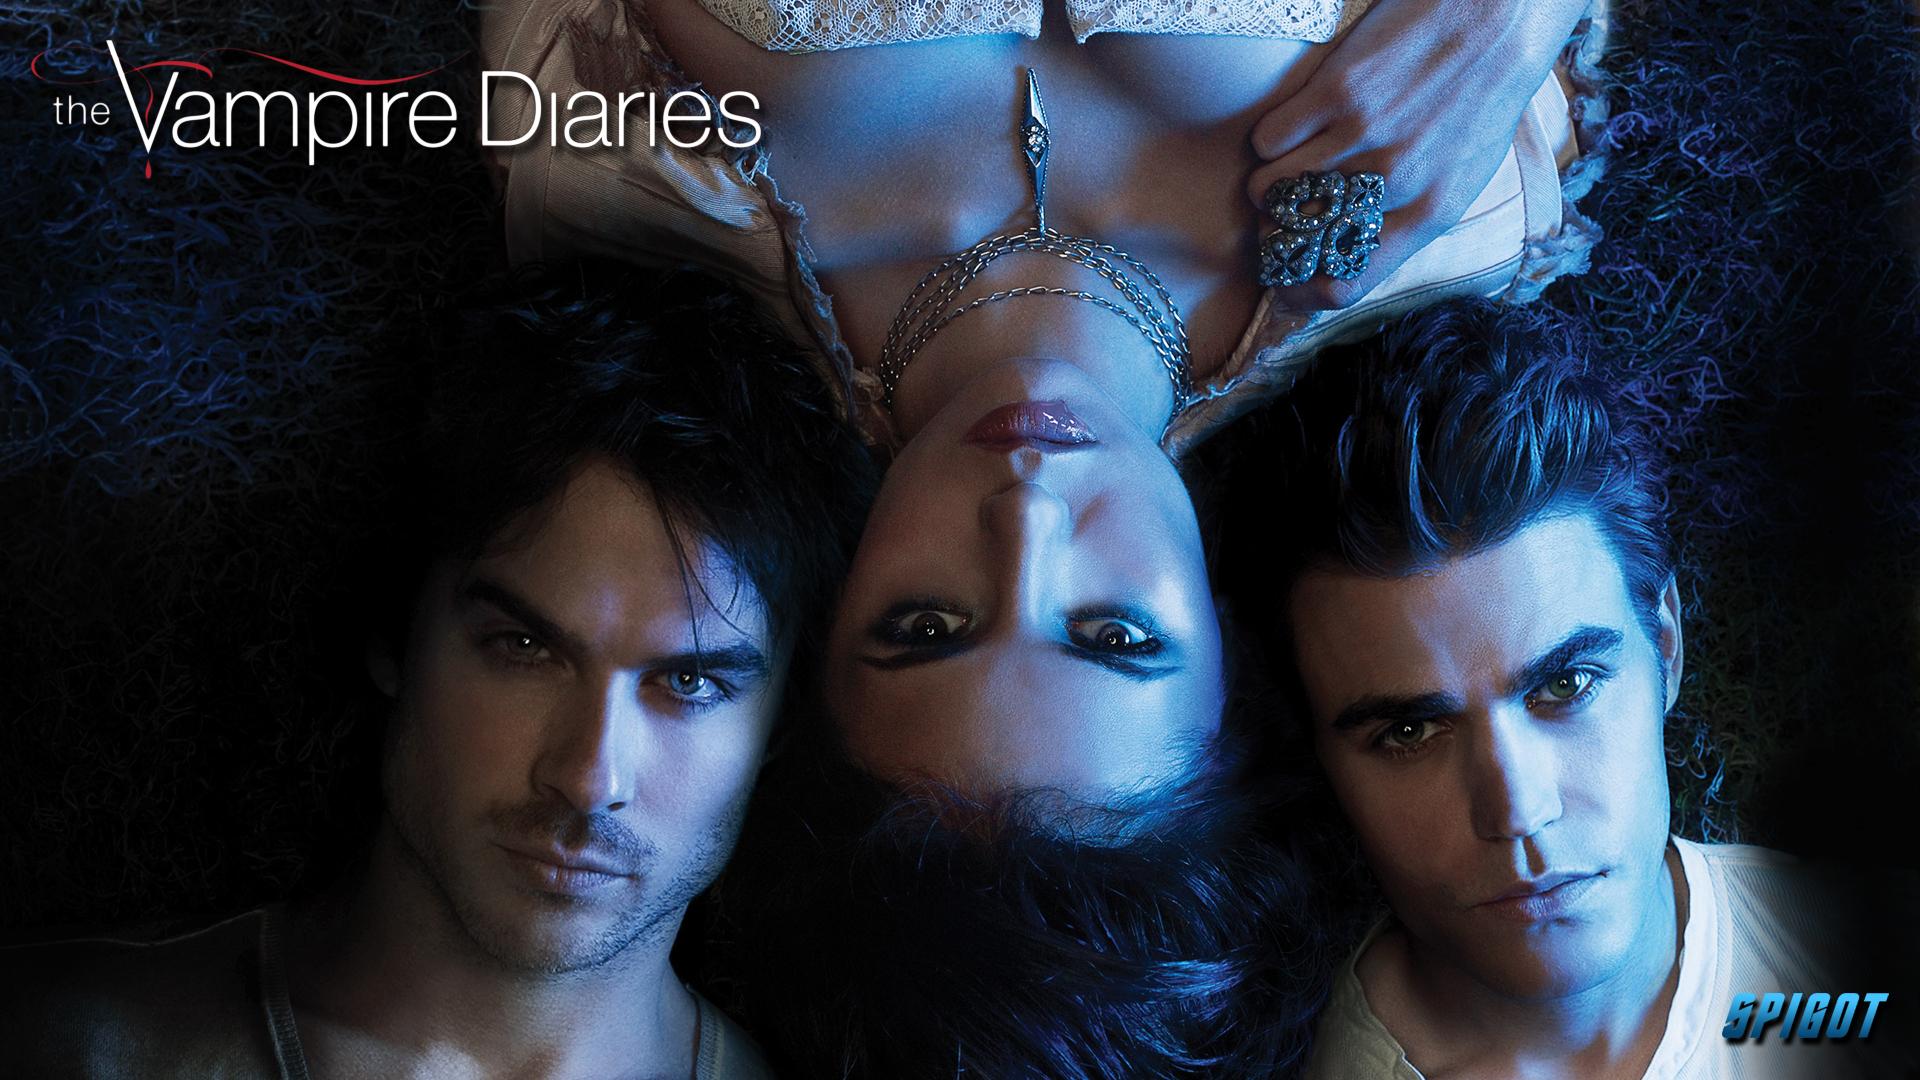 The Last Of The Vampire Diaries Wallpapers George Spigot - Vampires Diaries Damon Elena Stefan , HD Wallpaper & Backgrounds